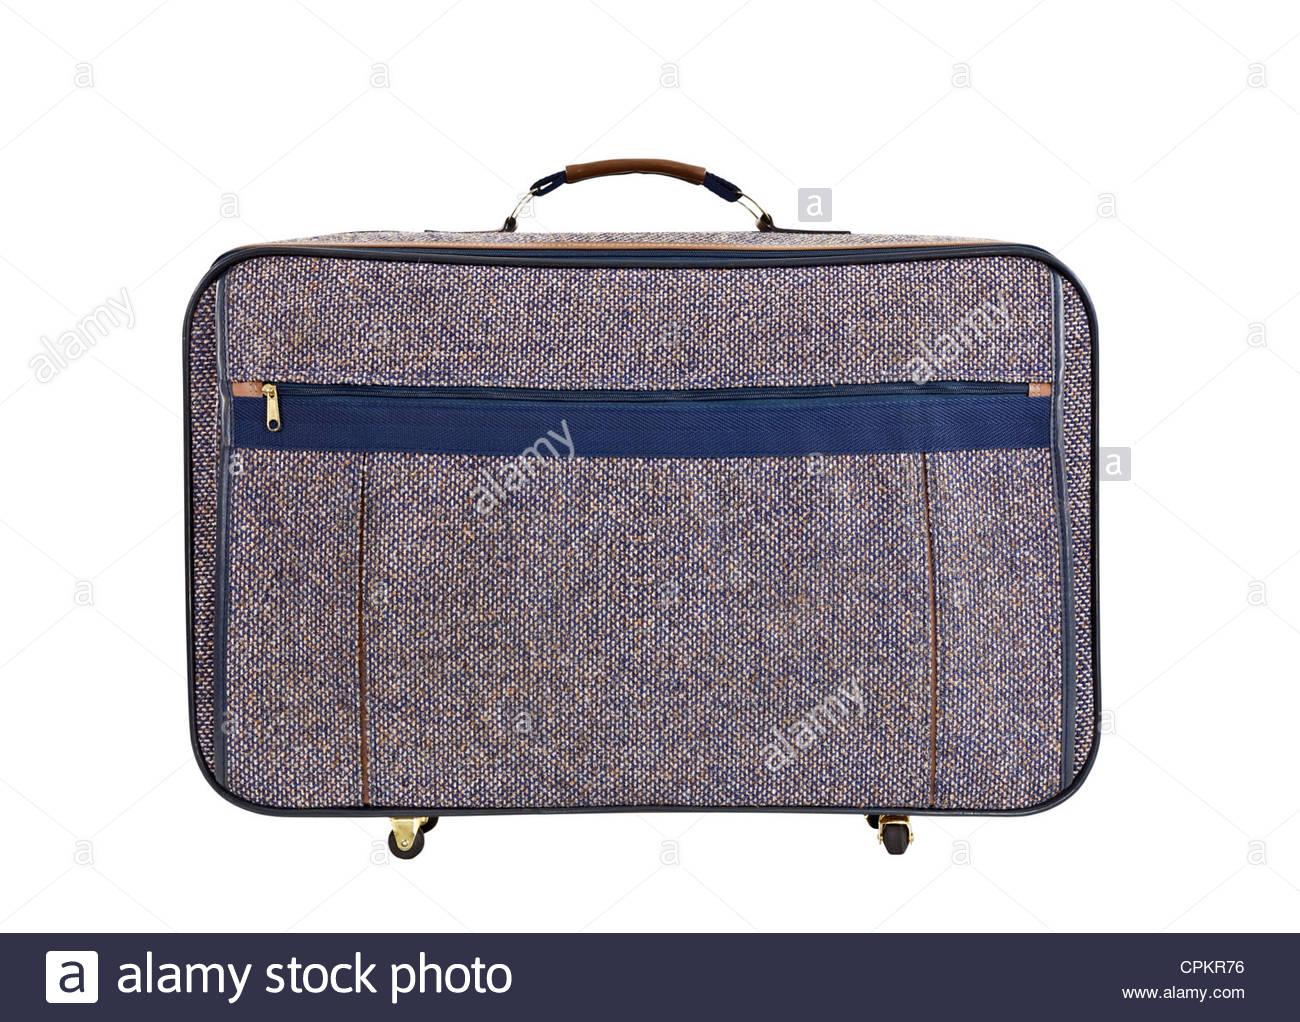 Old tweed suitcase isolated on white. - Stock Image